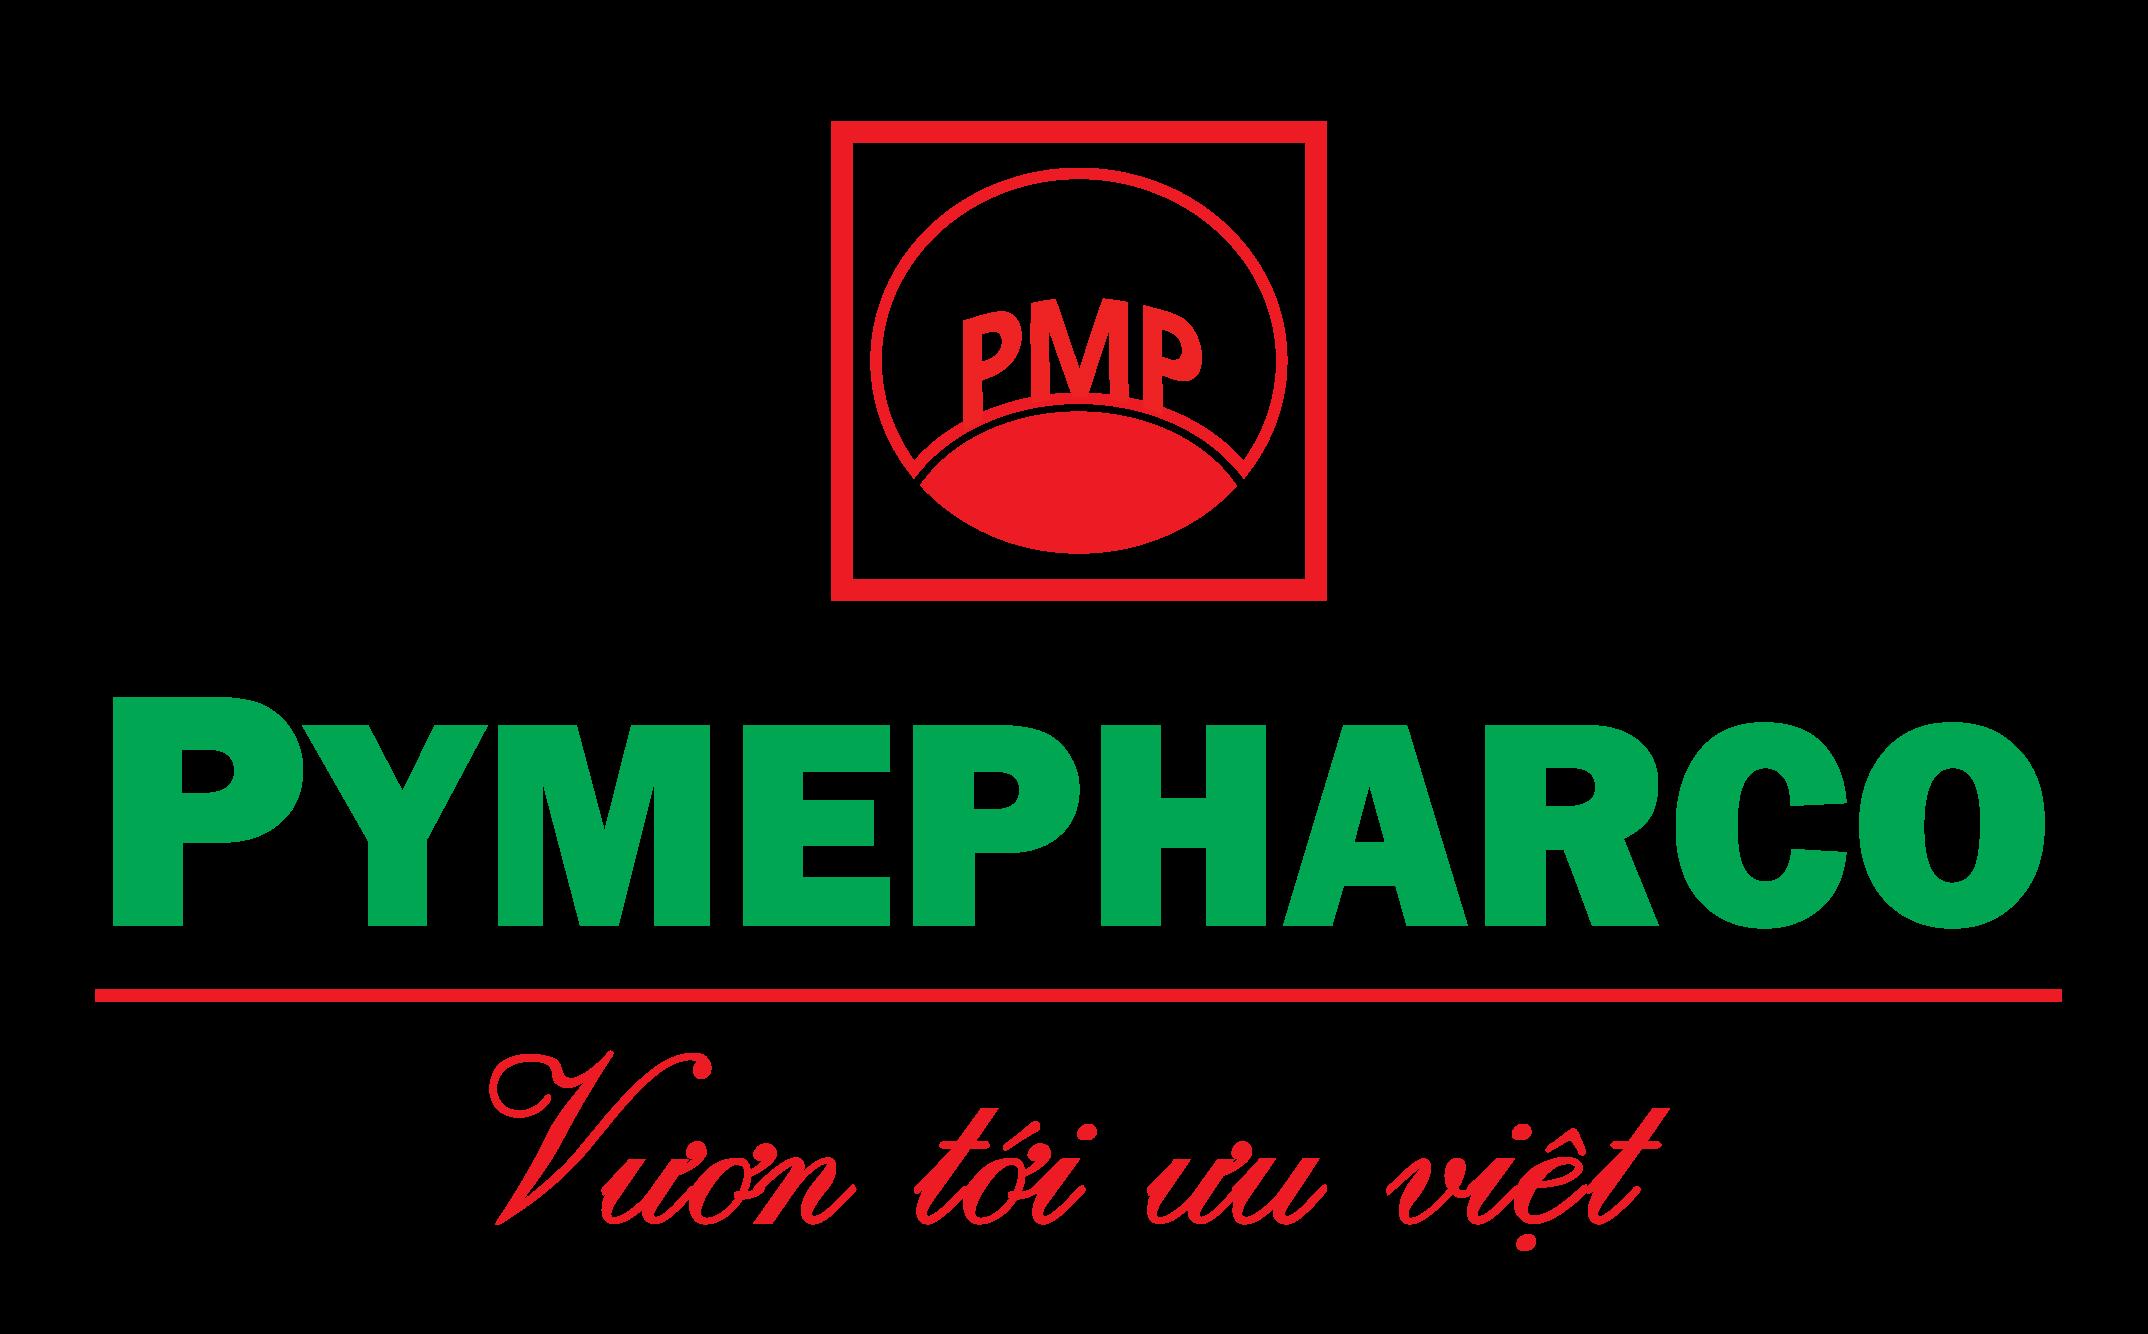 CÔNG TY CP PYMEPHARCO